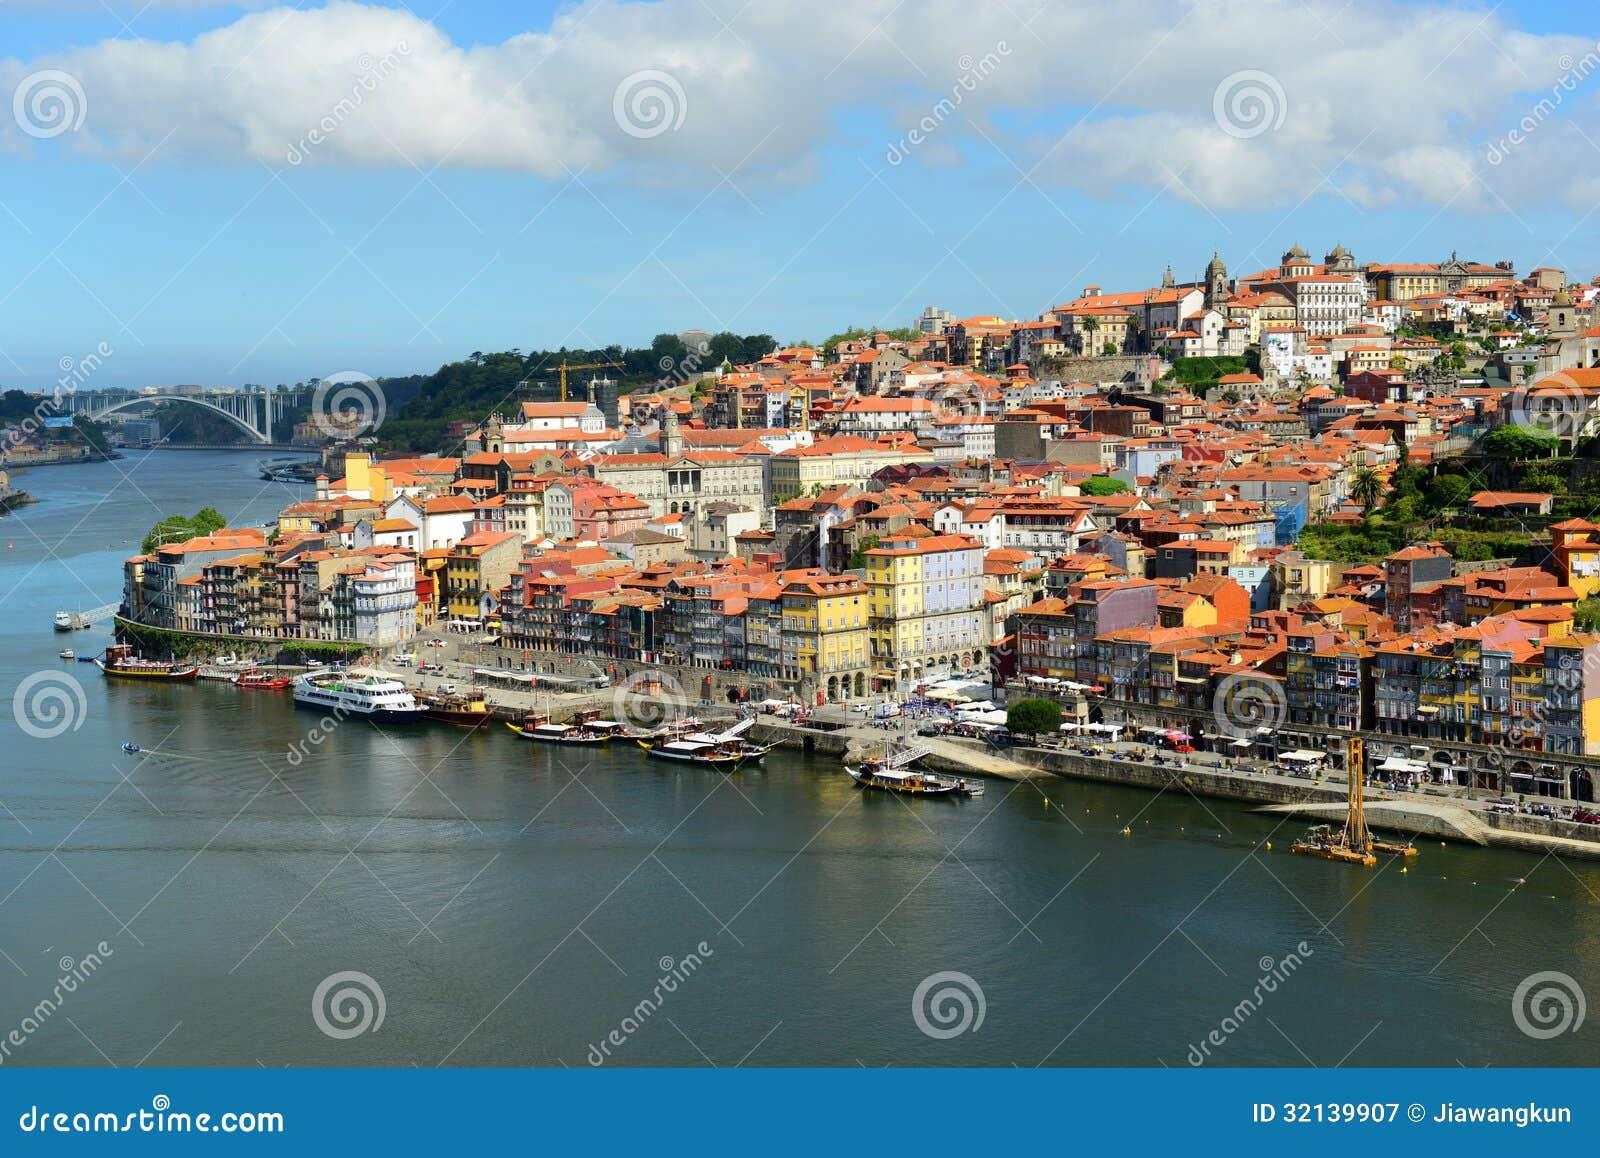 stadt fluss ansicht porto alte porto portugal. Black Bedroom Furniture Sets. Home Design Ideas